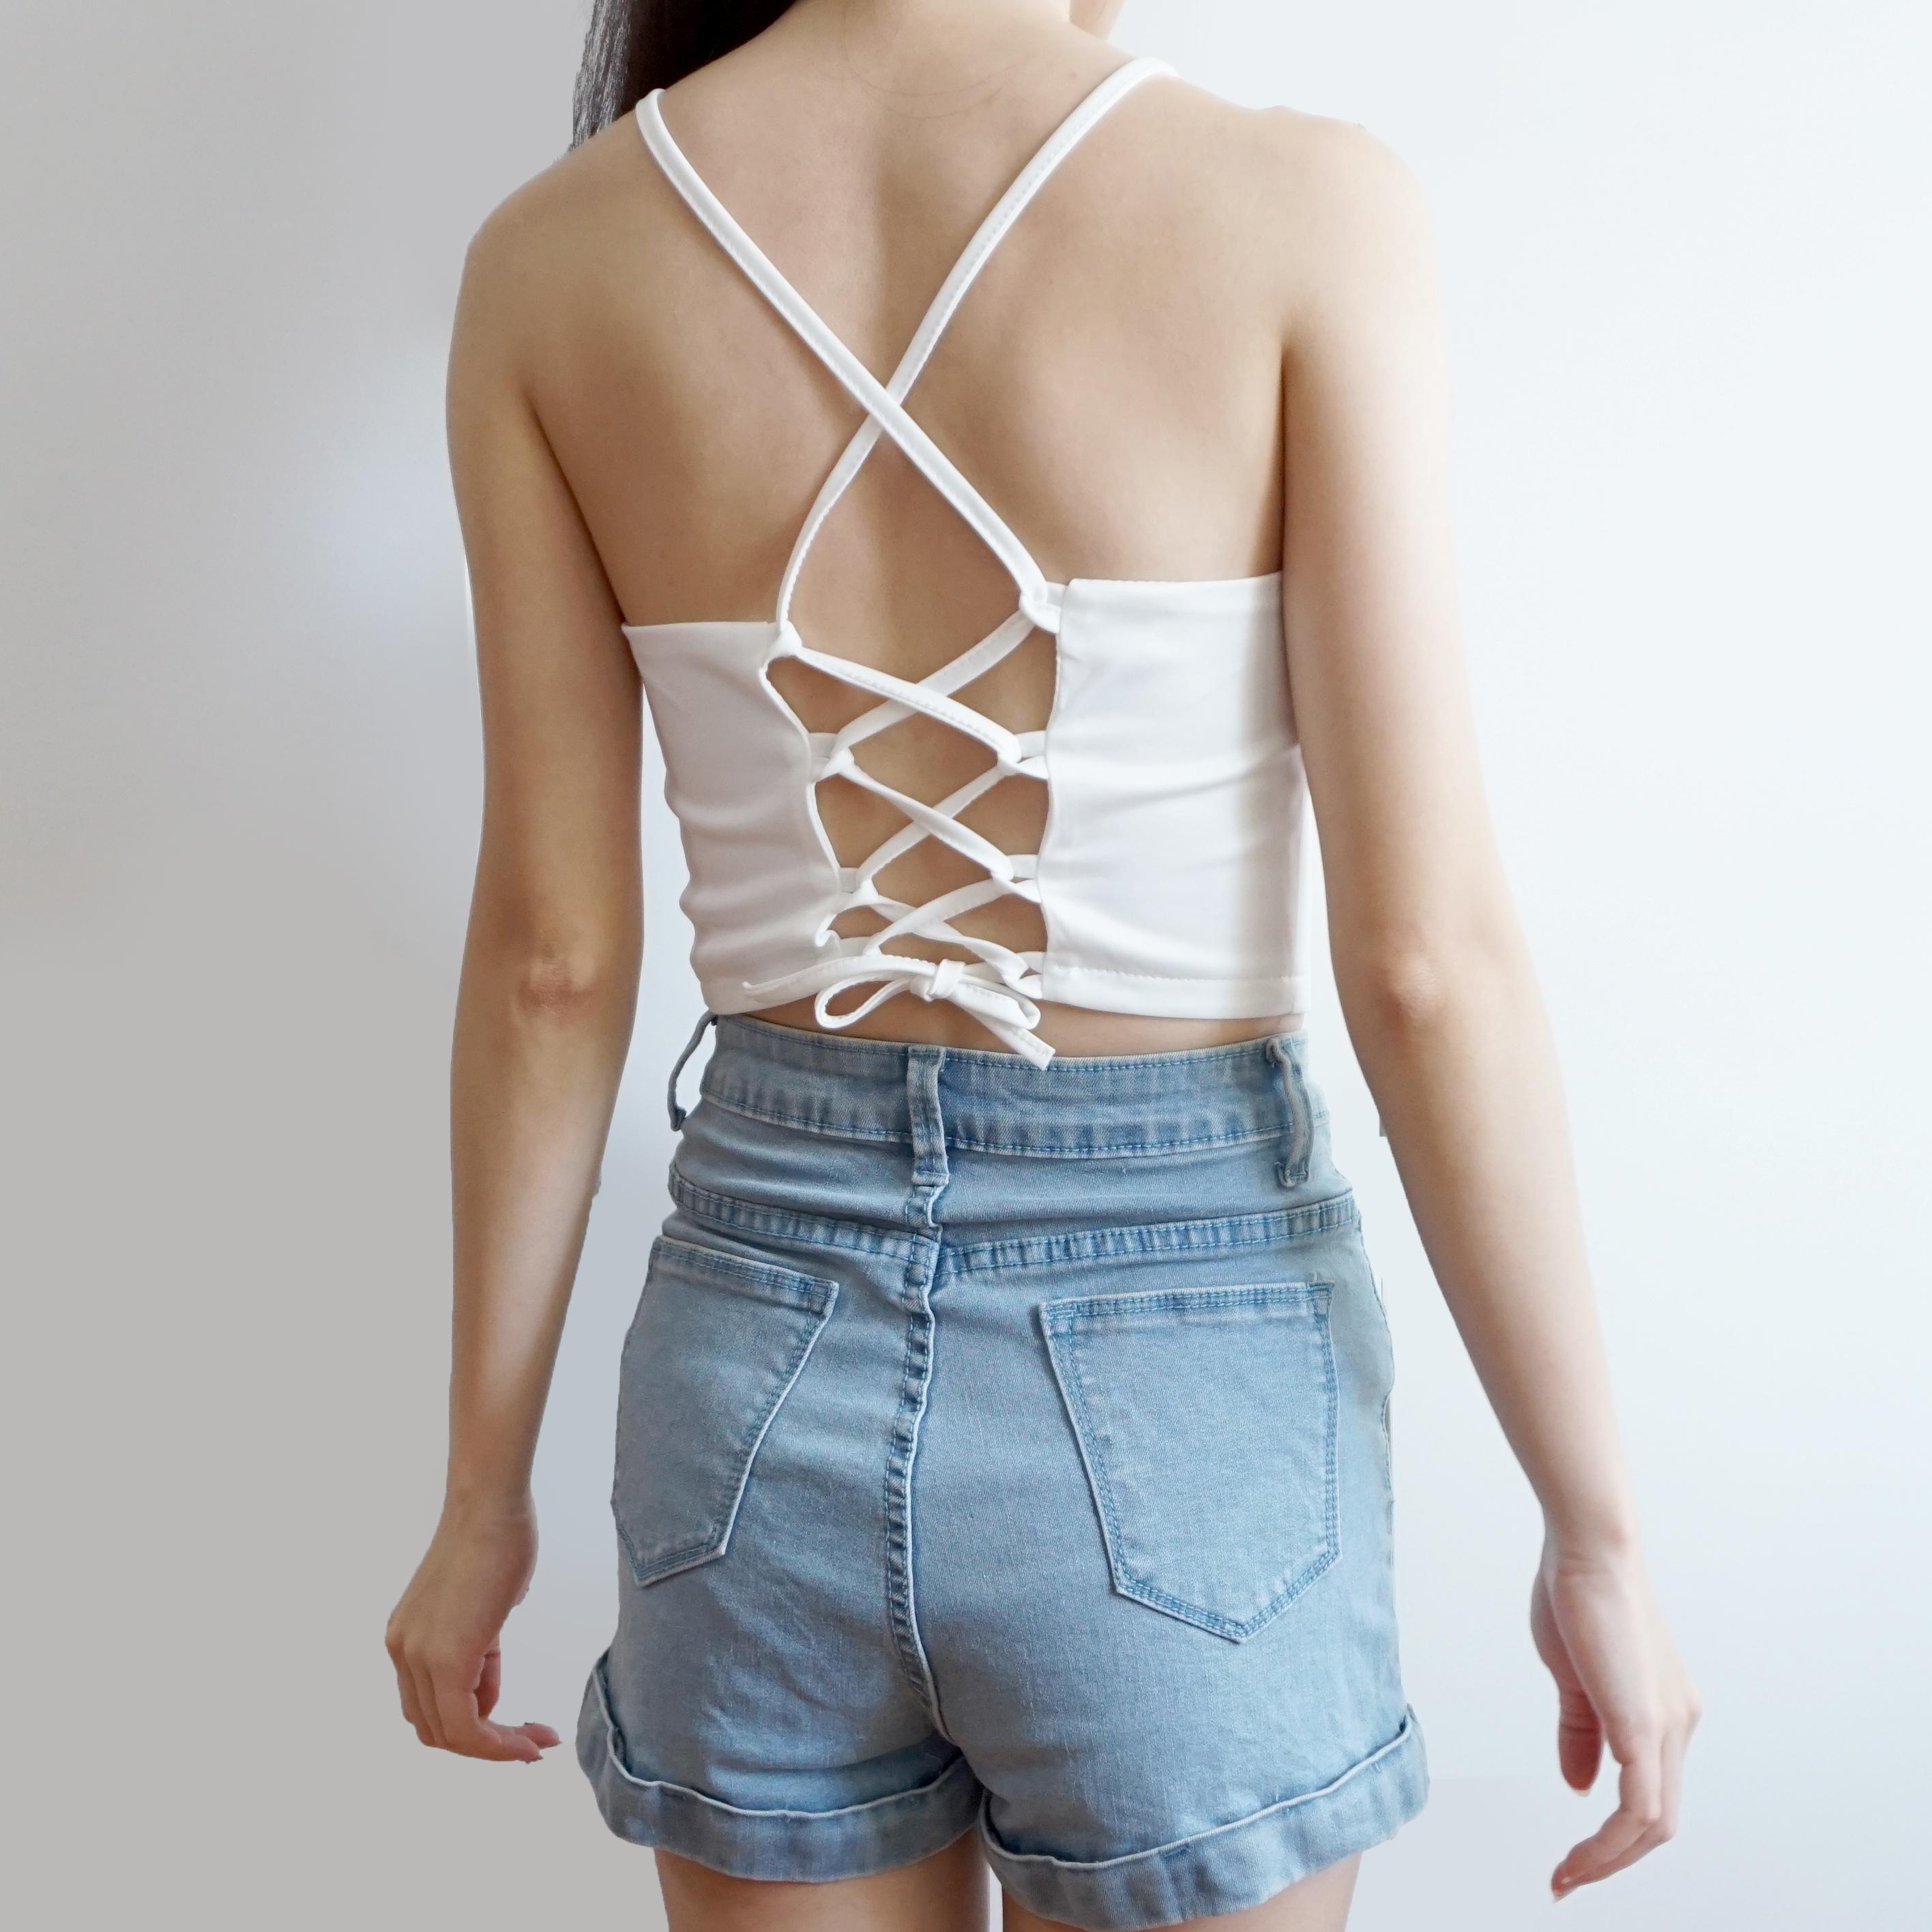 Crochet Cross Back Halter Crop Top 2 Colors Megoosta Fashion